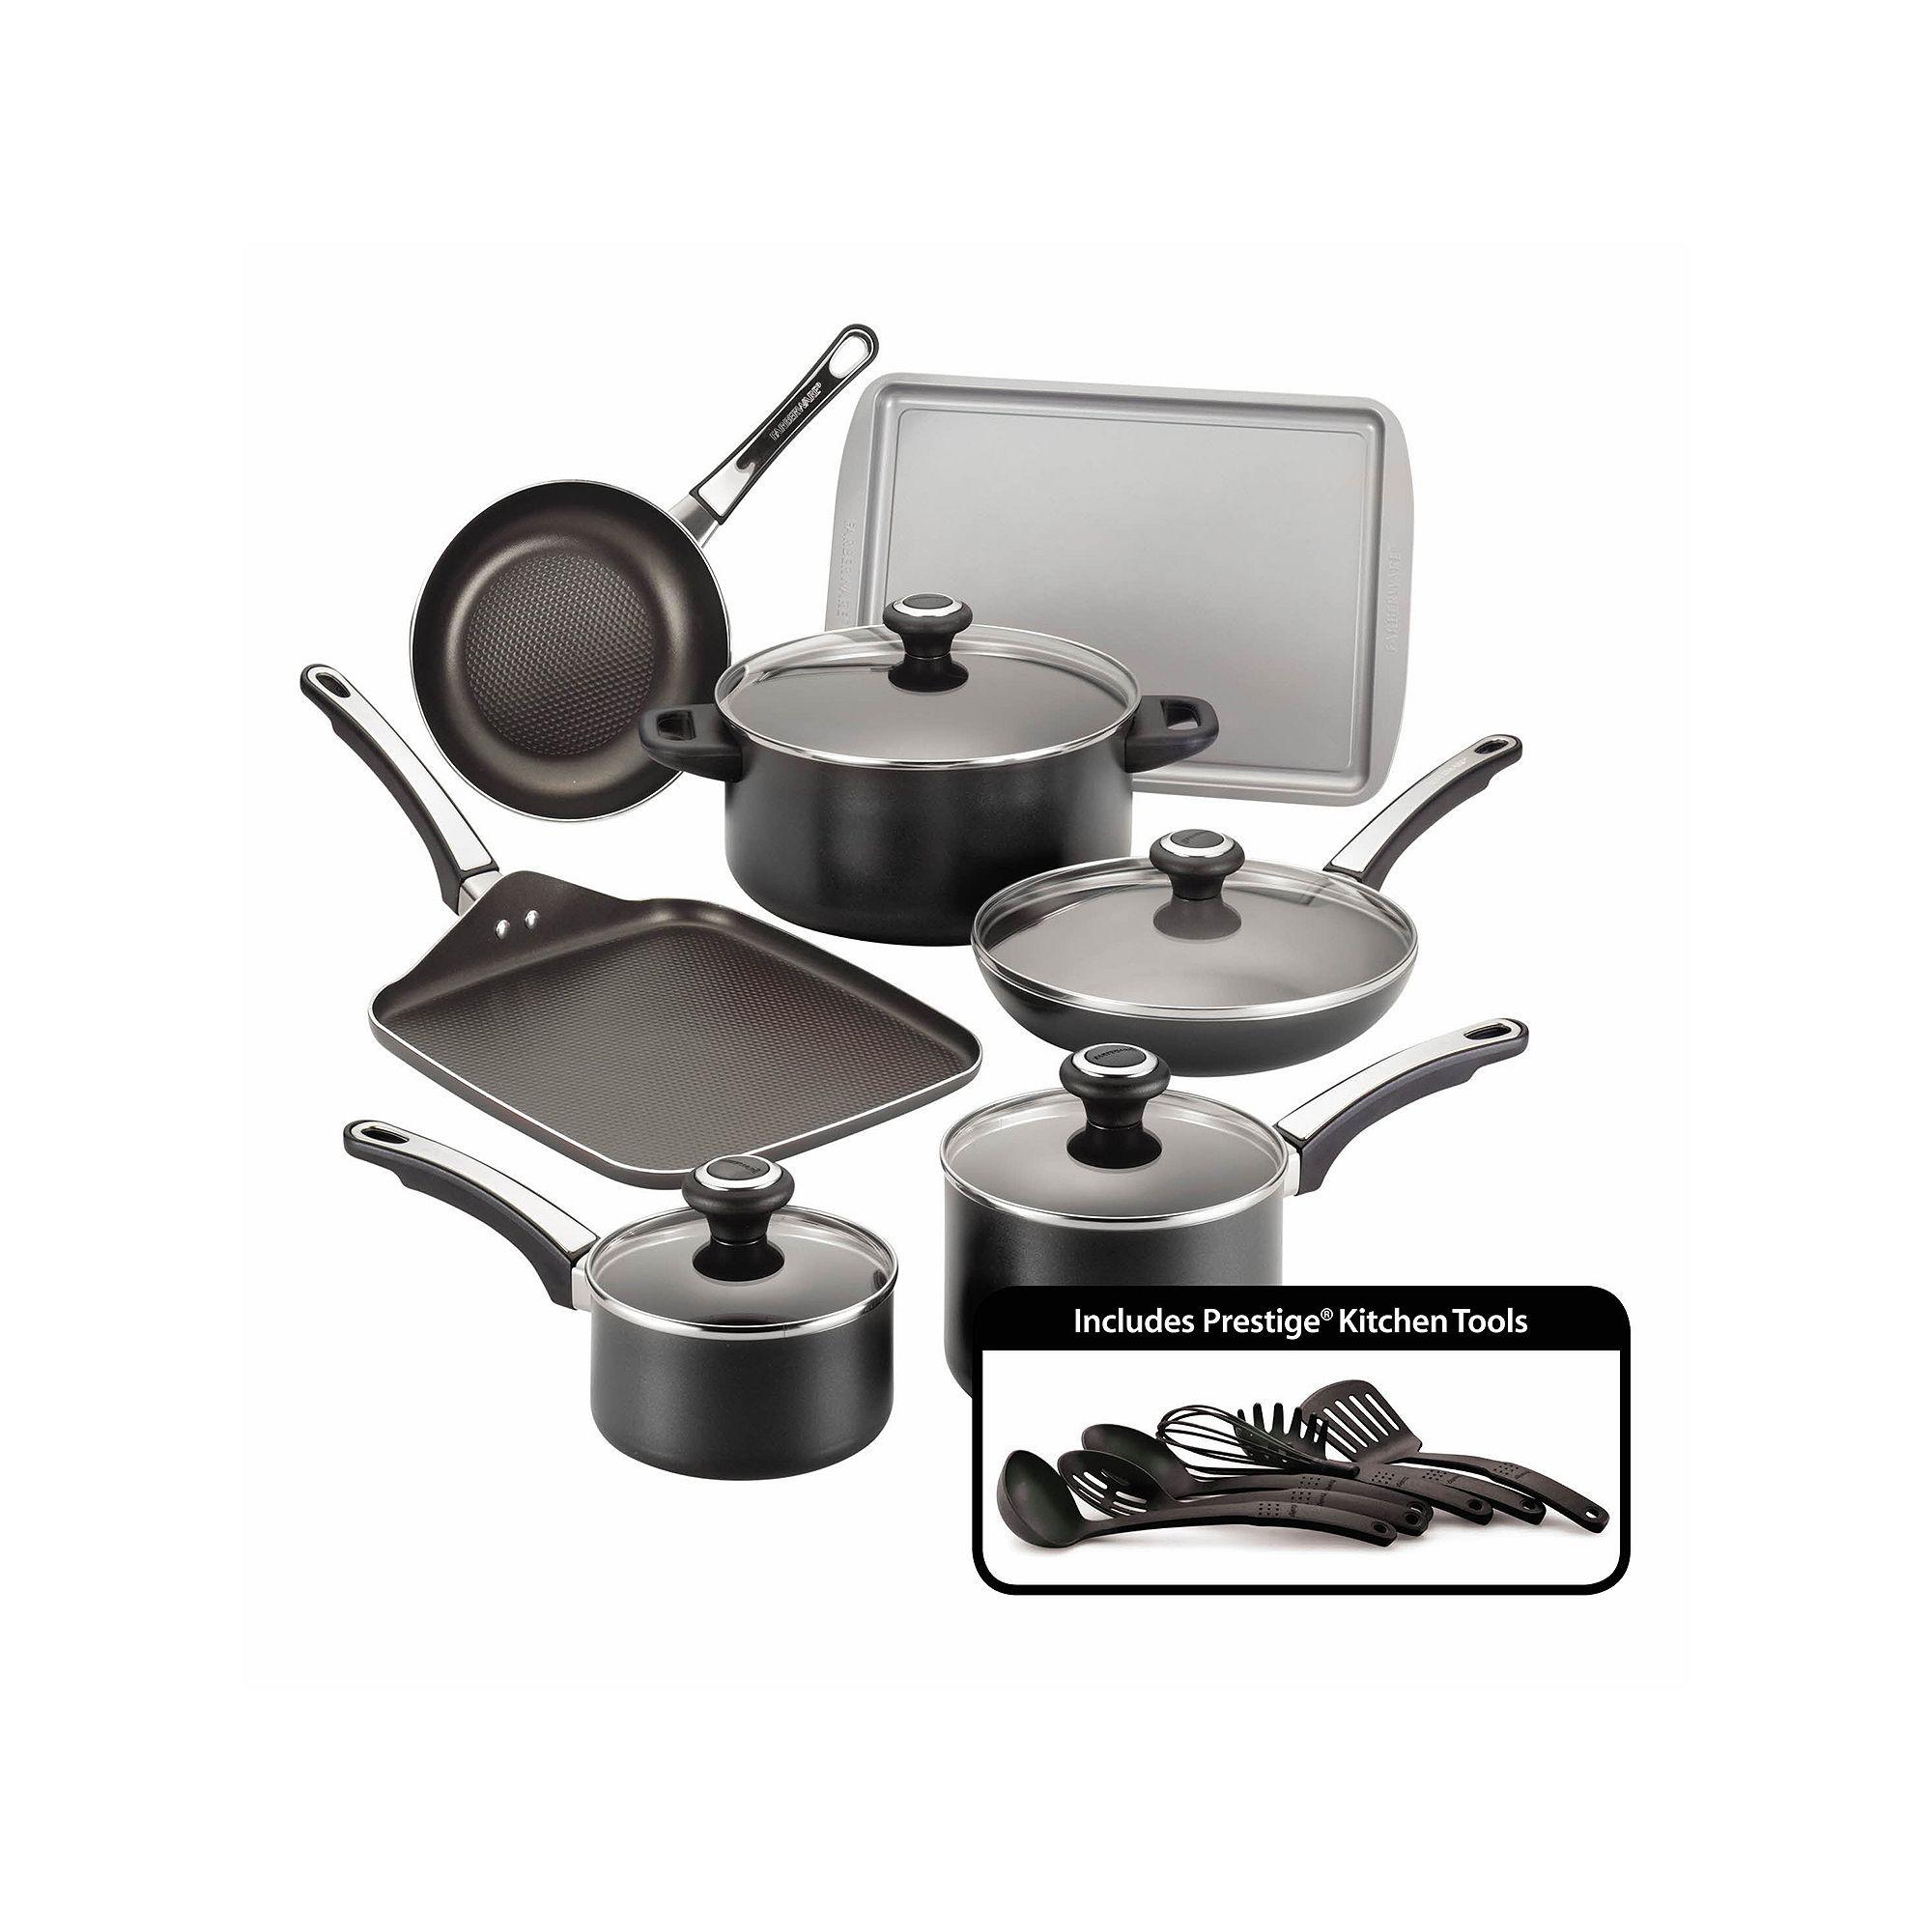 Farberware High Performance 17 Pc Nonstick Cookware Set